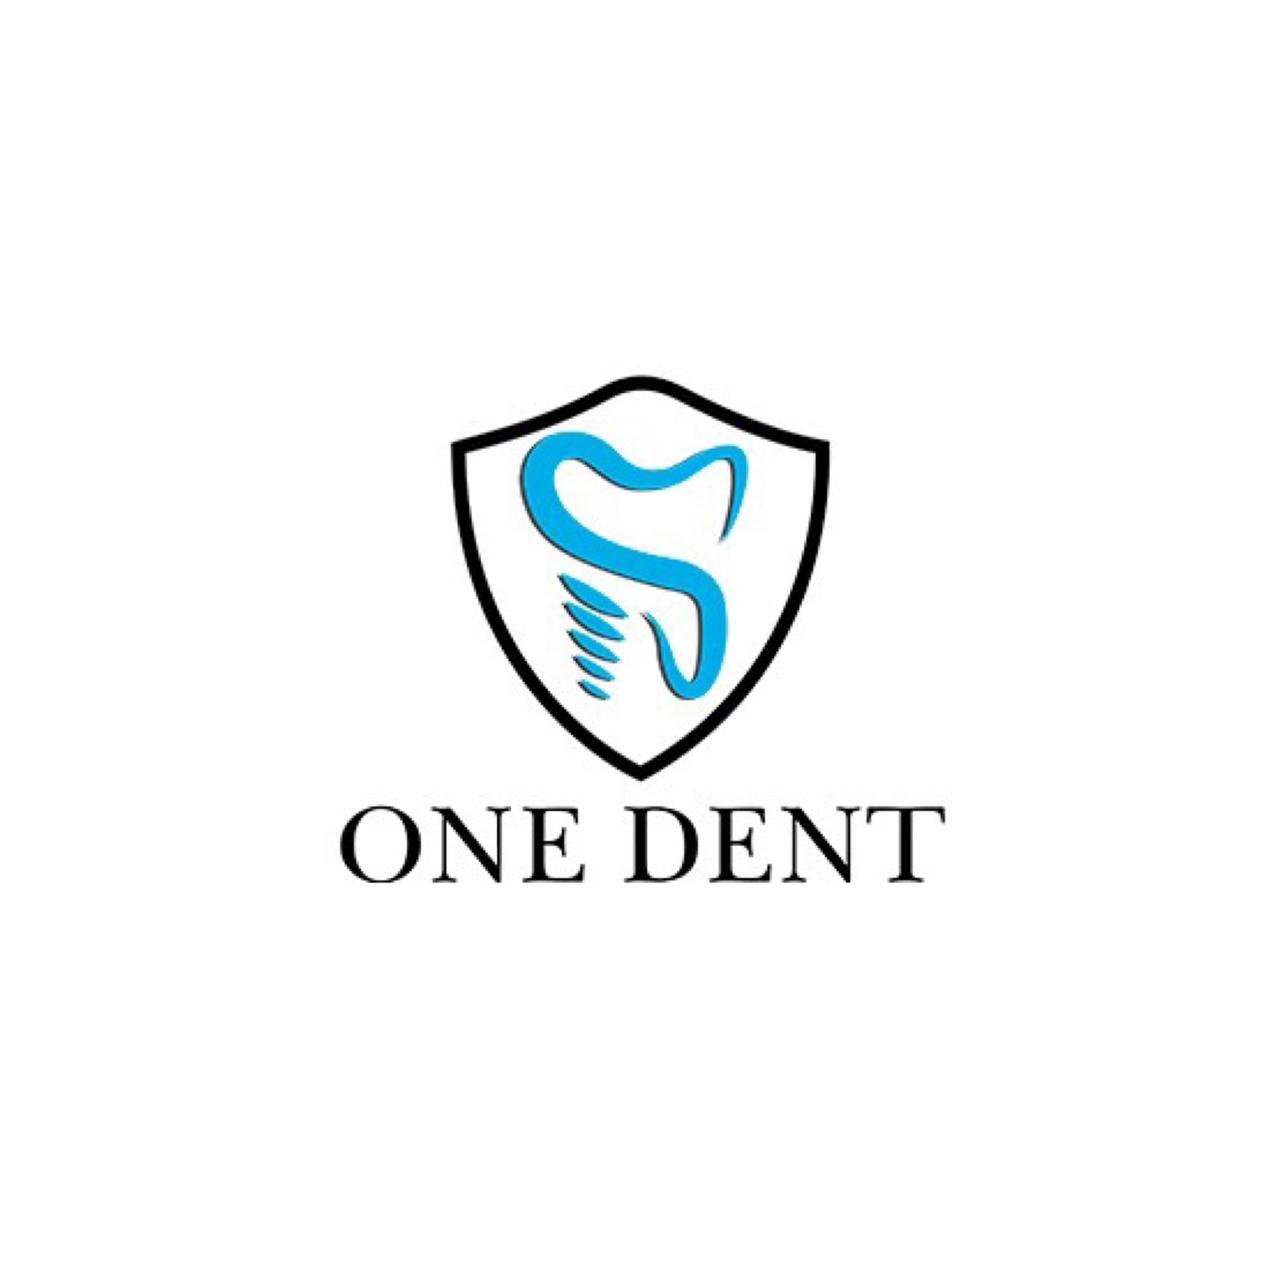 One Dent hekimtap.az